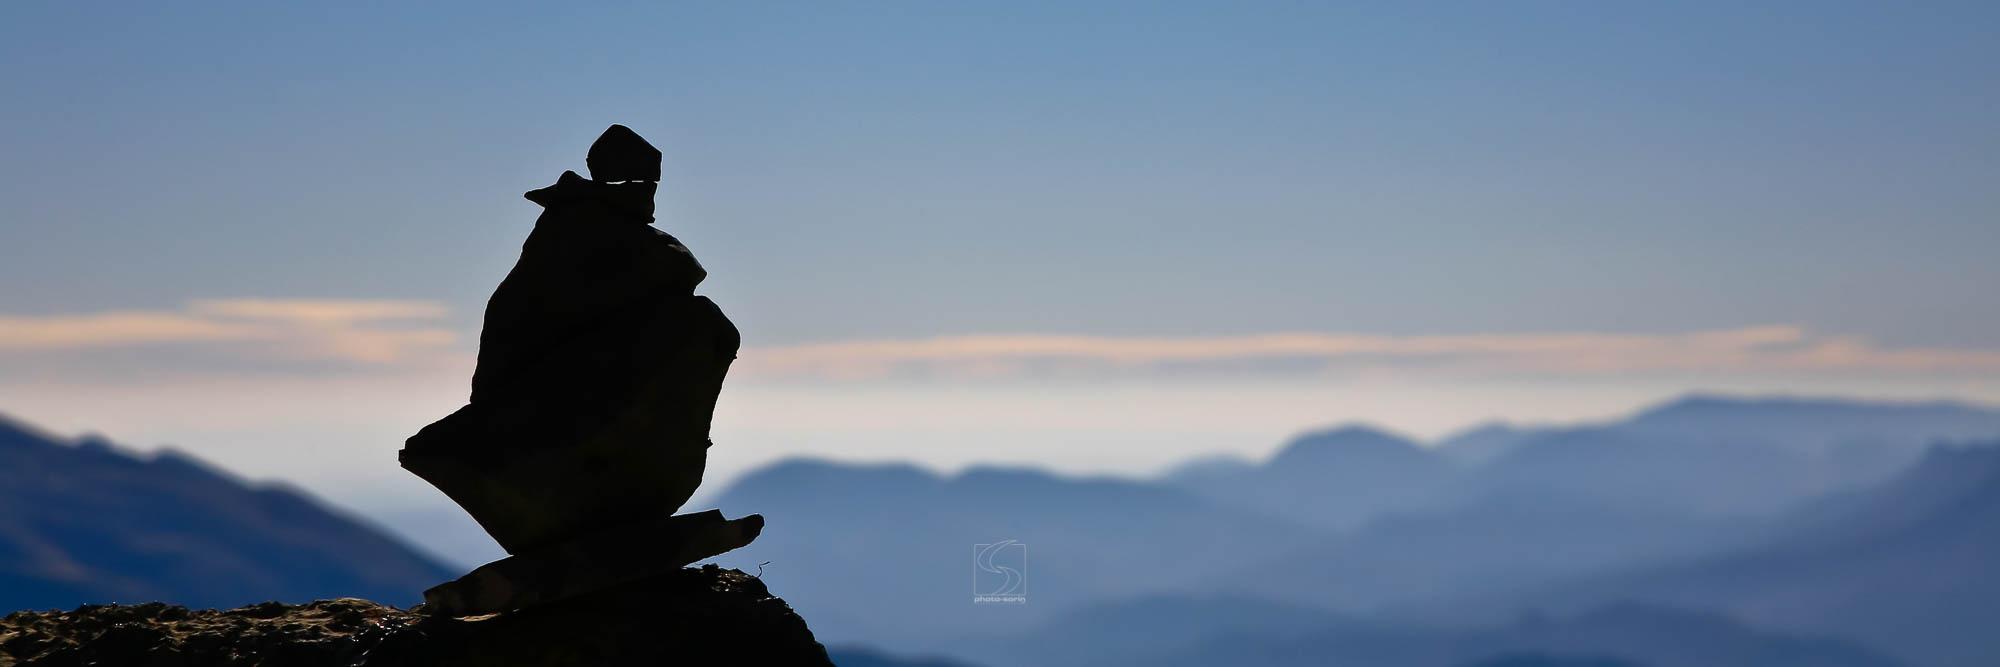 FIGURATIF<br>Voyage en Montagne